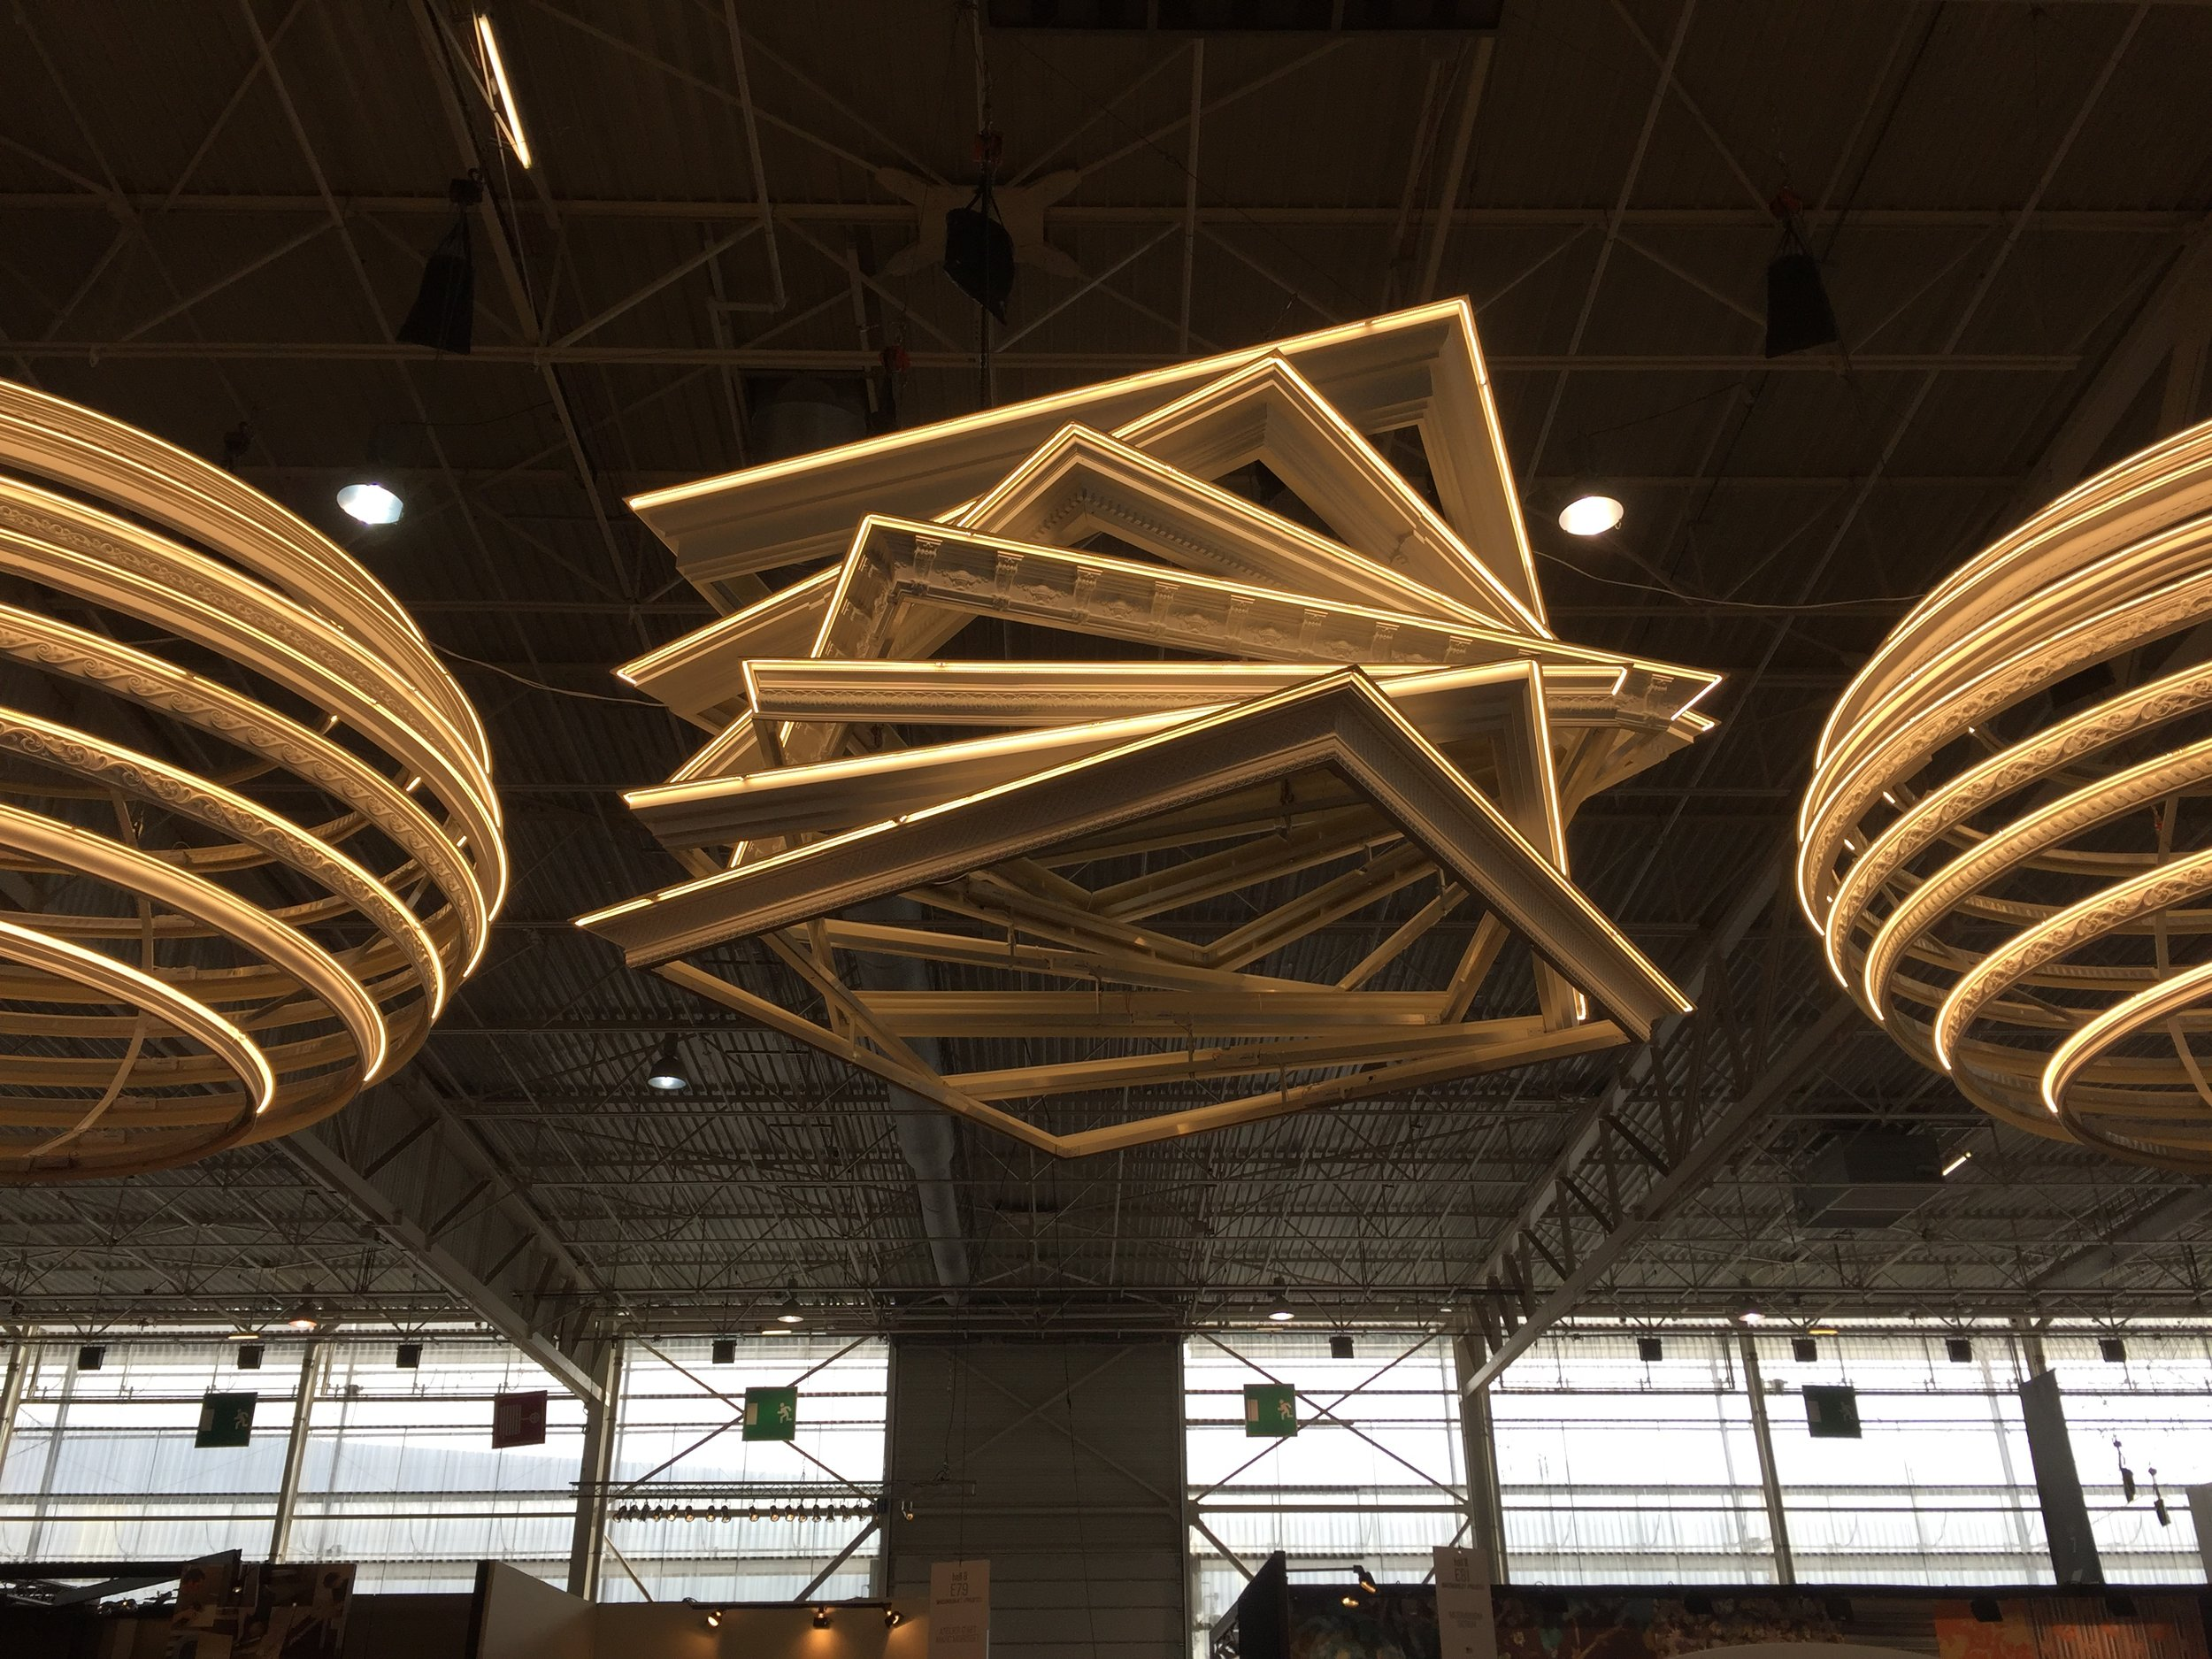 Maison&Objet 2016 September edition - Lighting installation | Masha Shapiro Agency.jpg